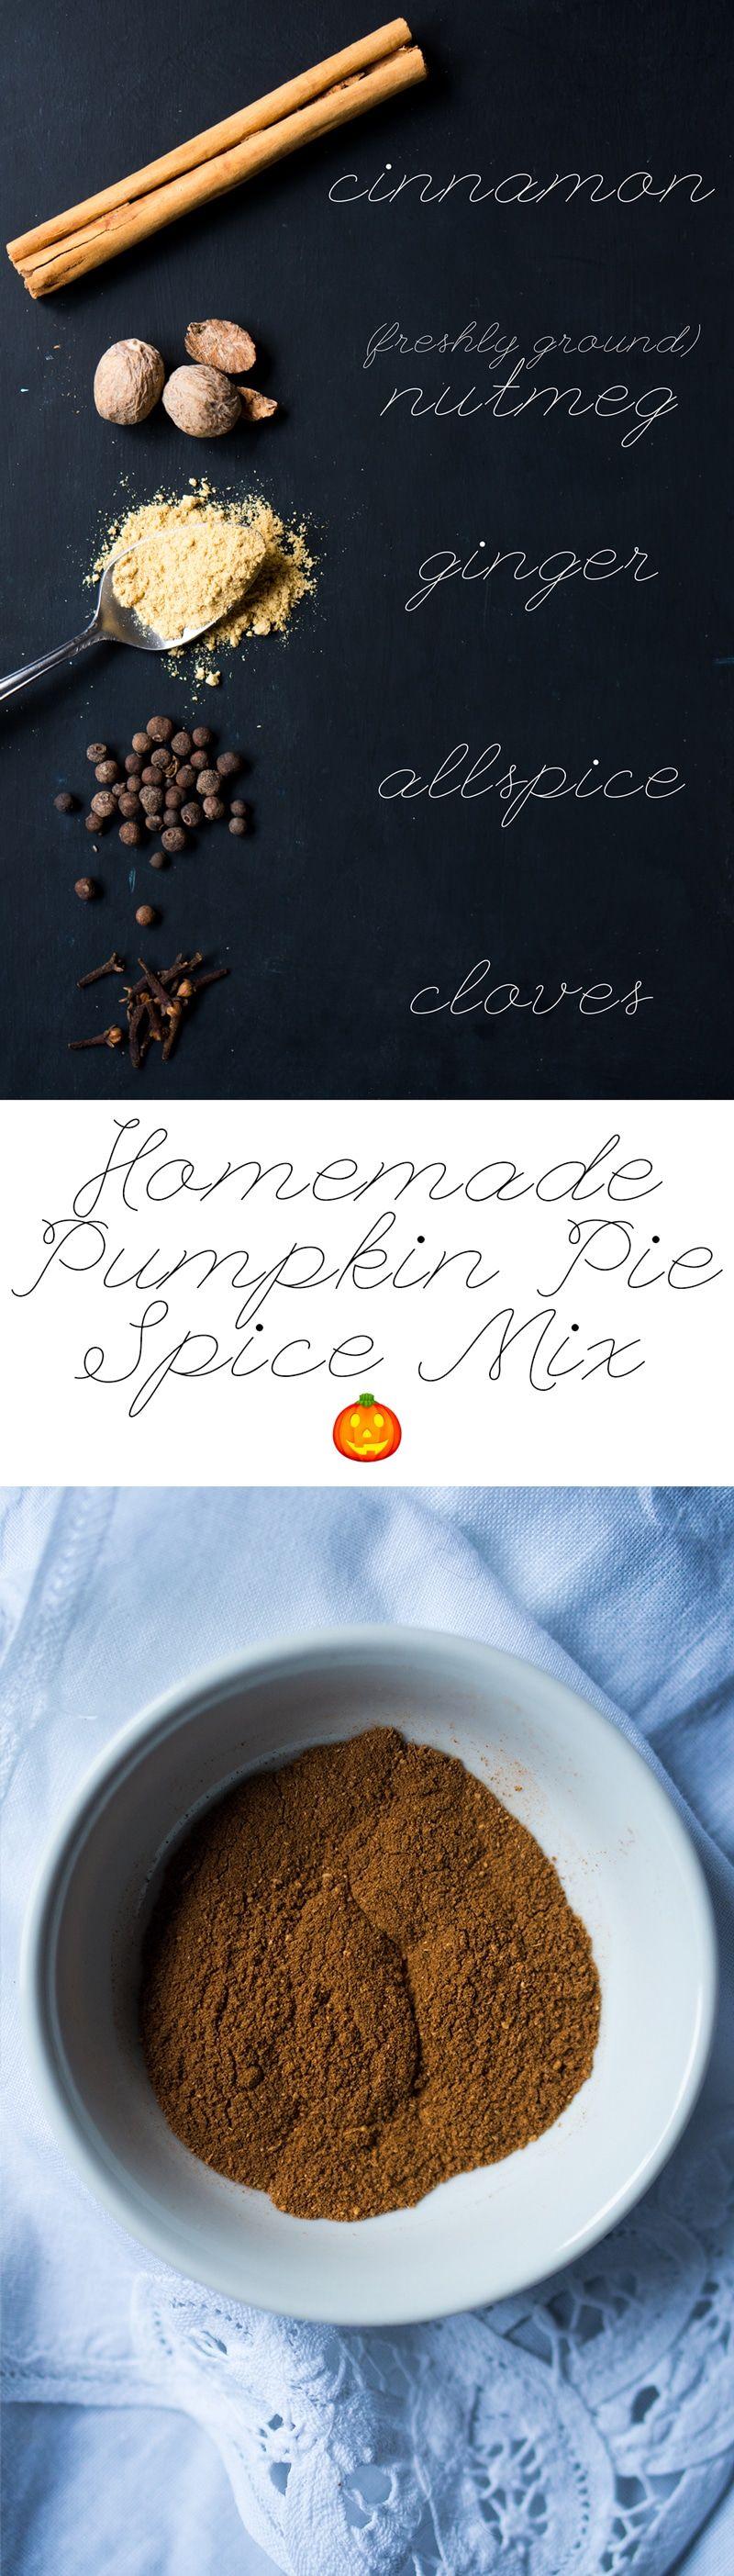 Homemade Pumpkin Pie Spice Mix 🎃 Pumpkin pie spice mix